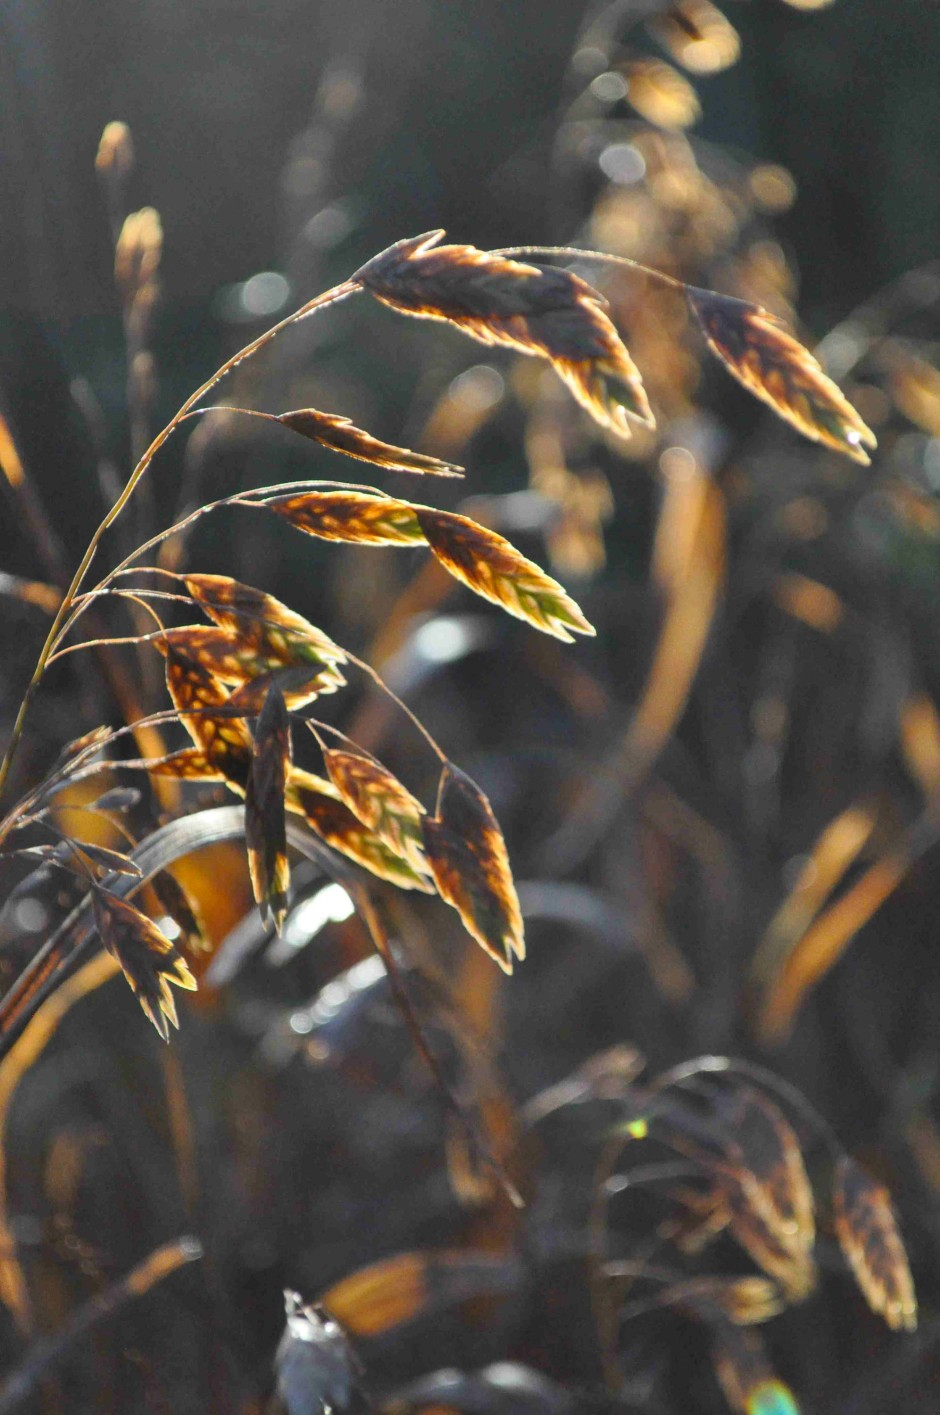 Pflanzen morbide sch nheit drinnen drau en faz for Pflanzen drinnen